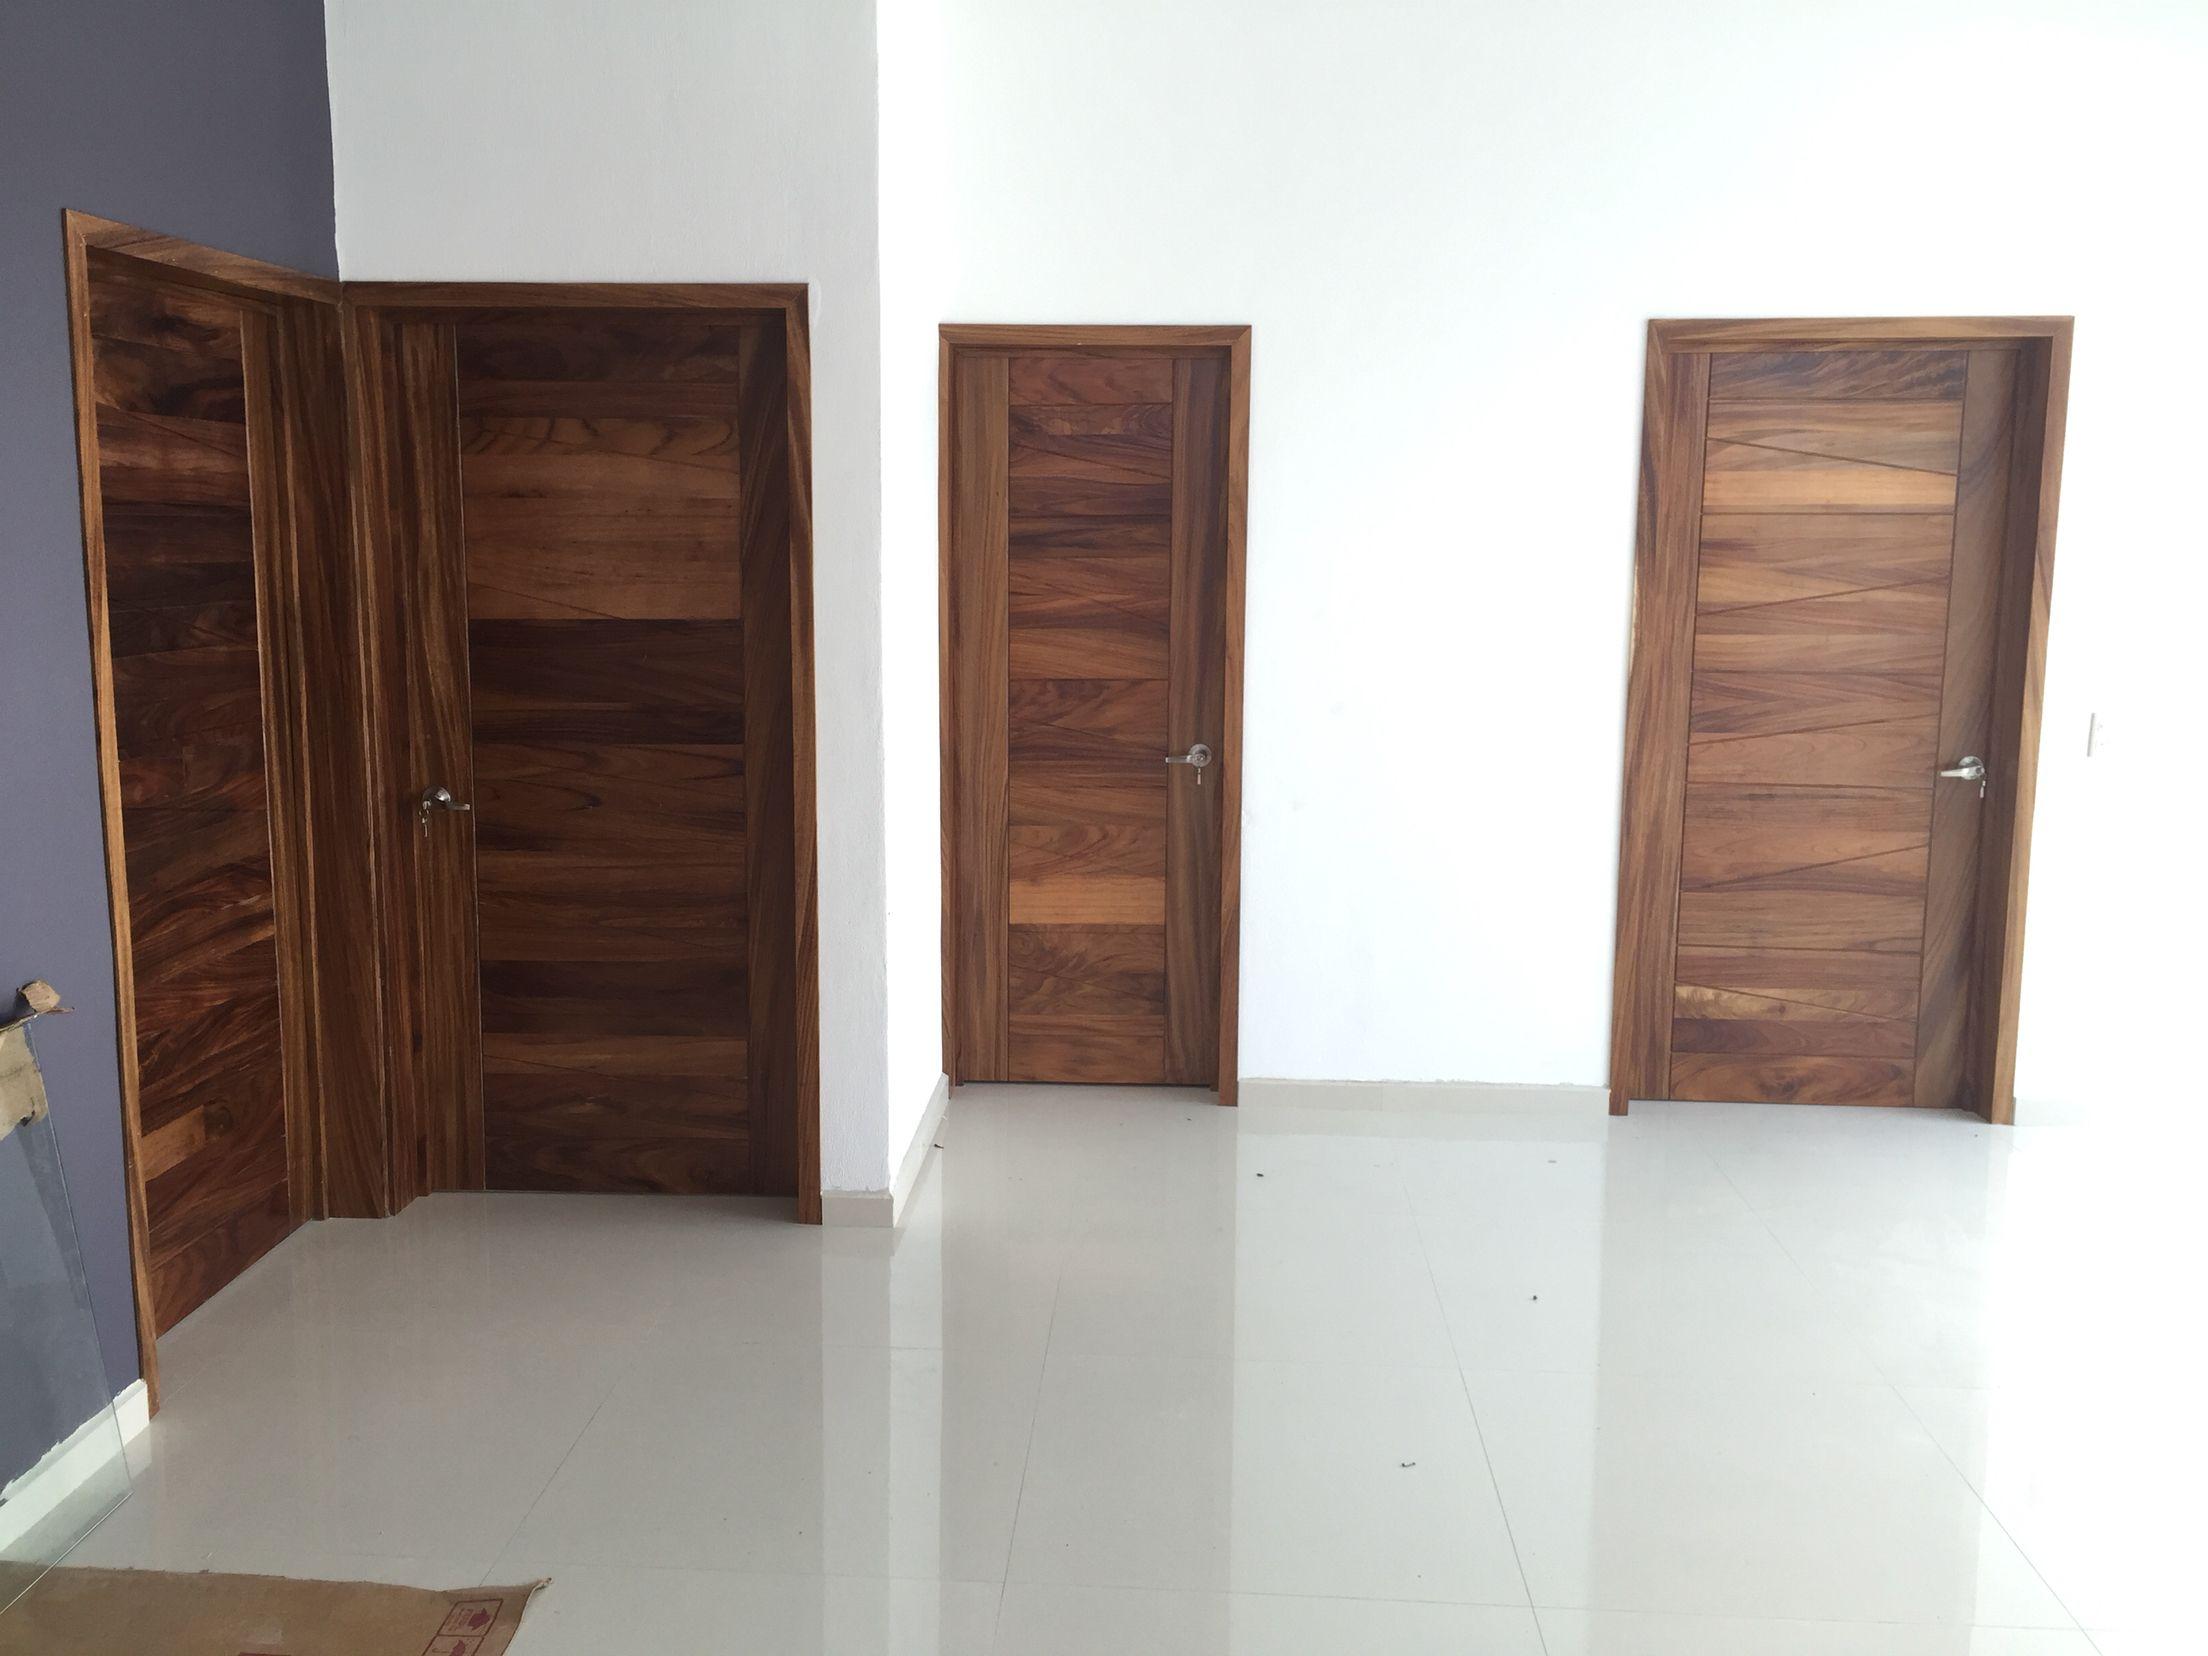 Puertas en madera de parota puertas pinterest madera for Puertas de entrada de madera modernas